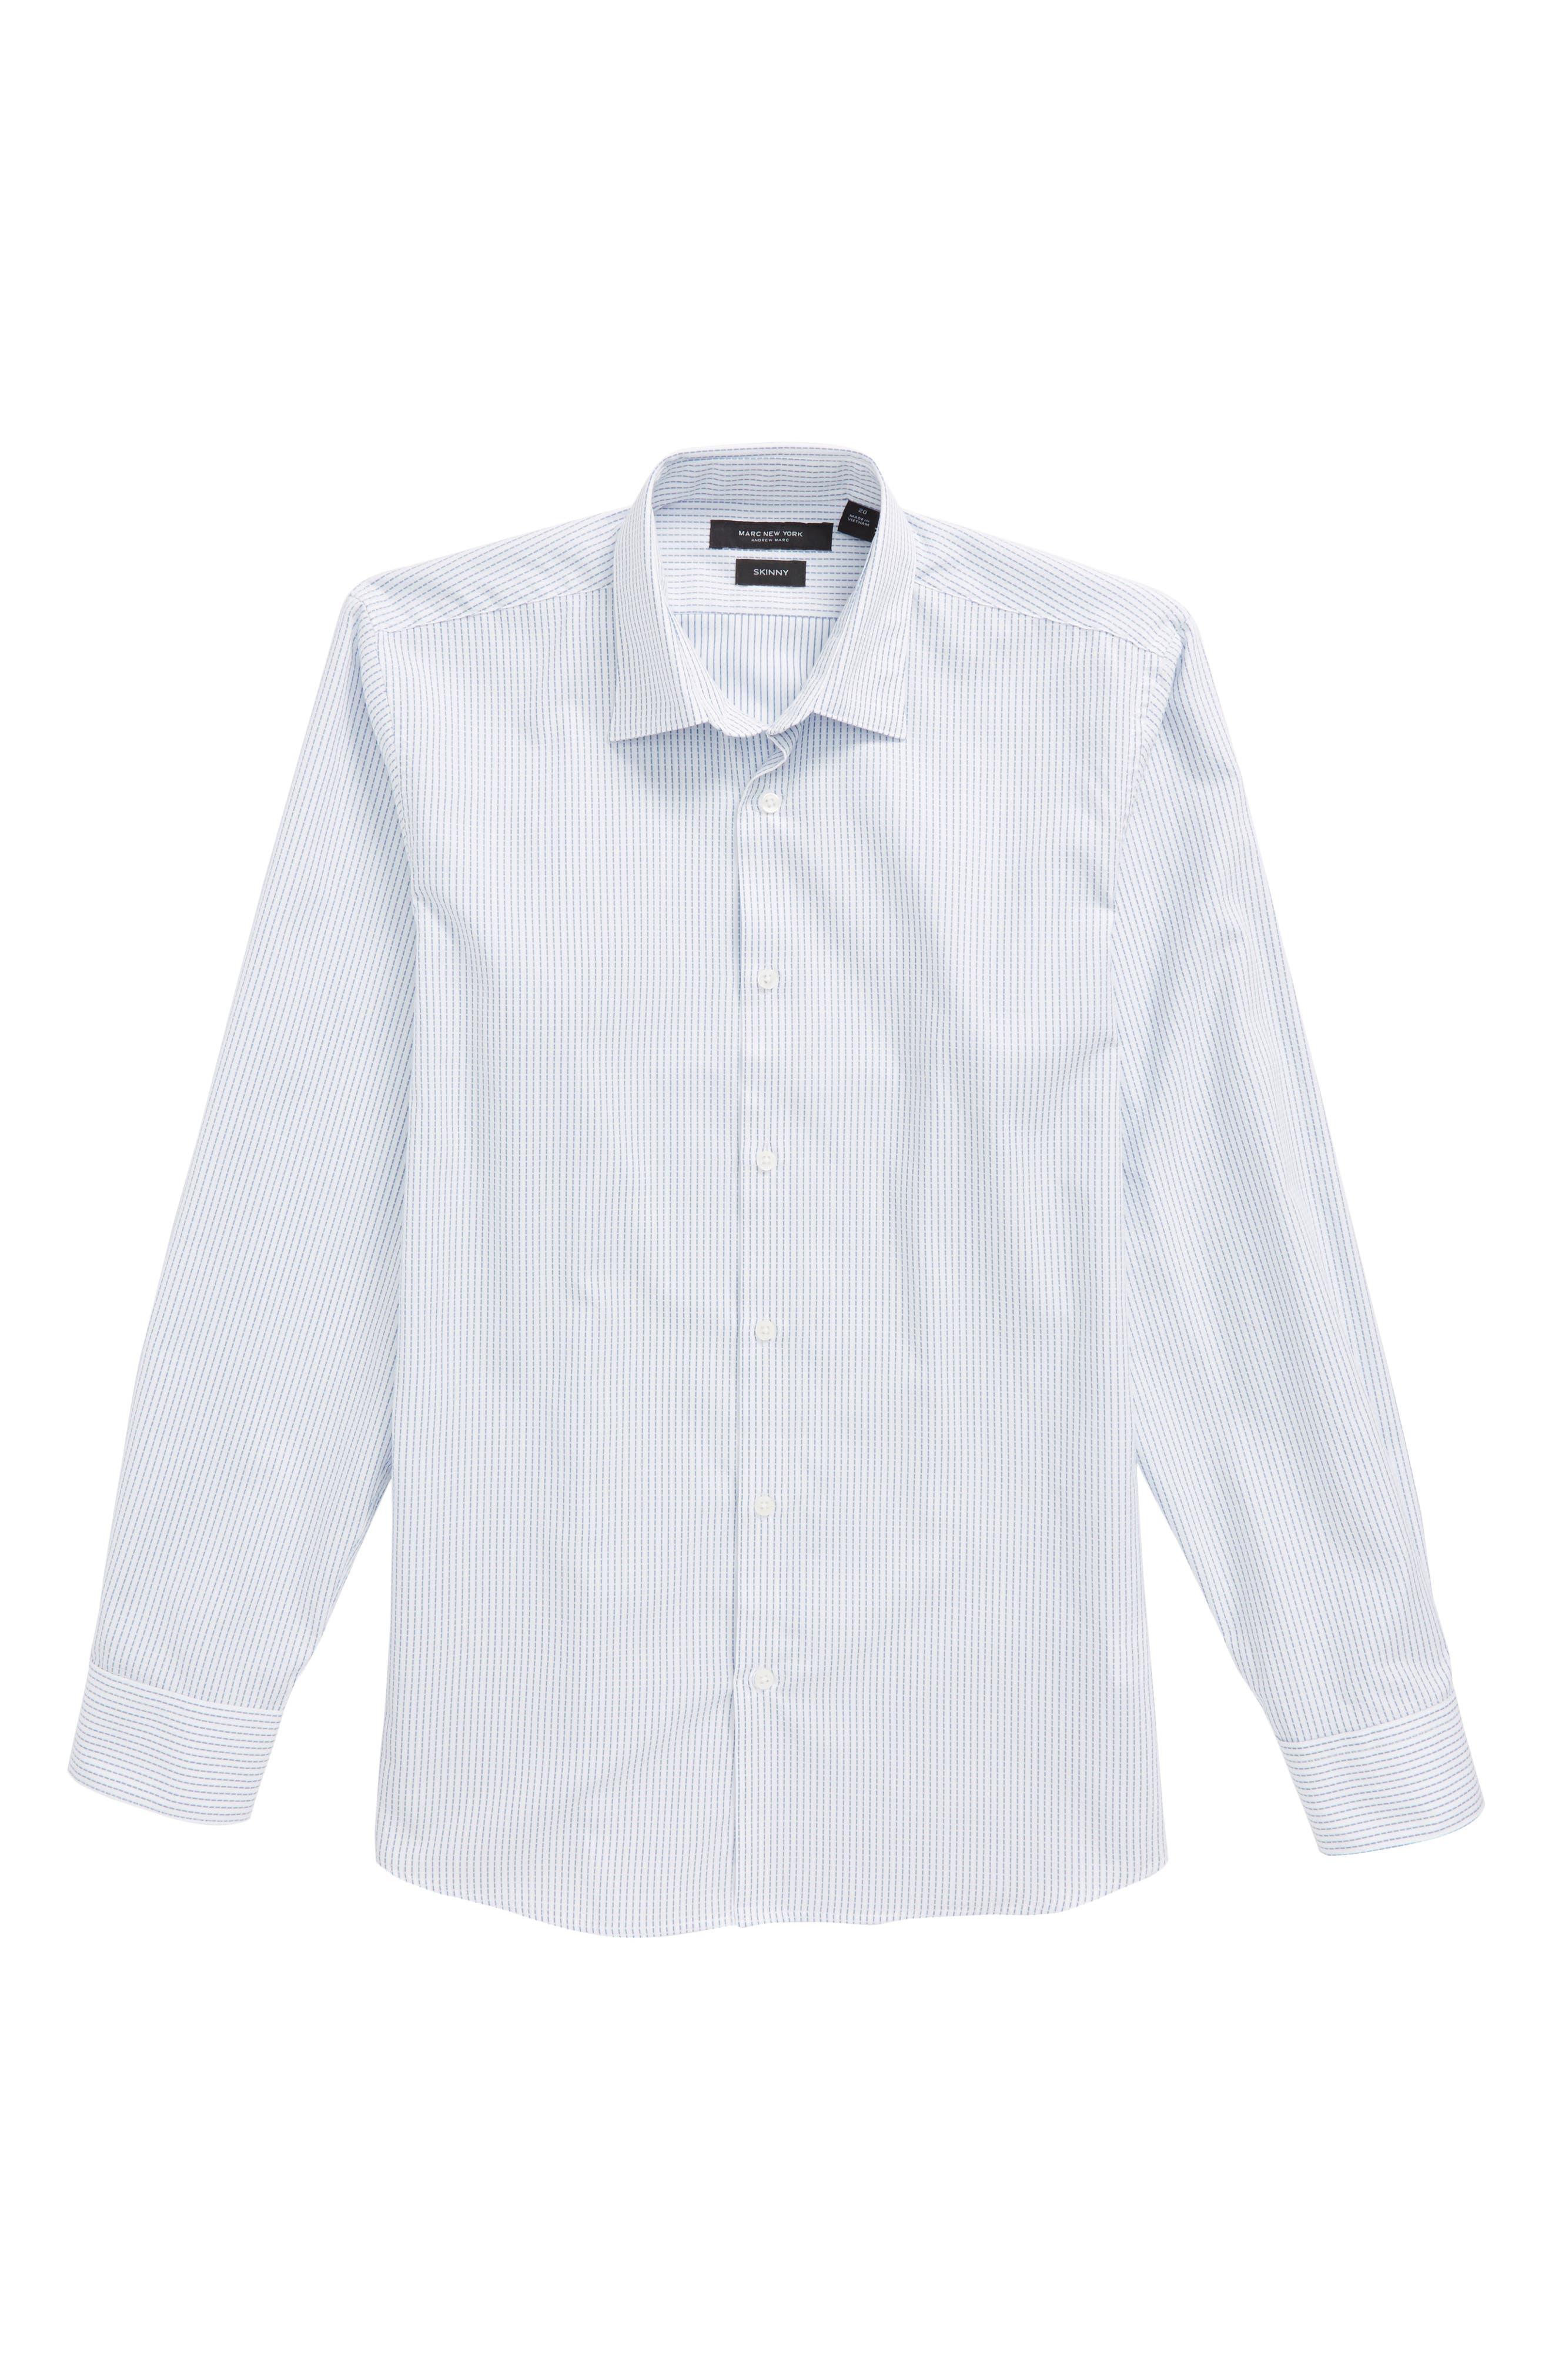 Stripe Dress Shirt,                         Main,                         color, White/ Blue